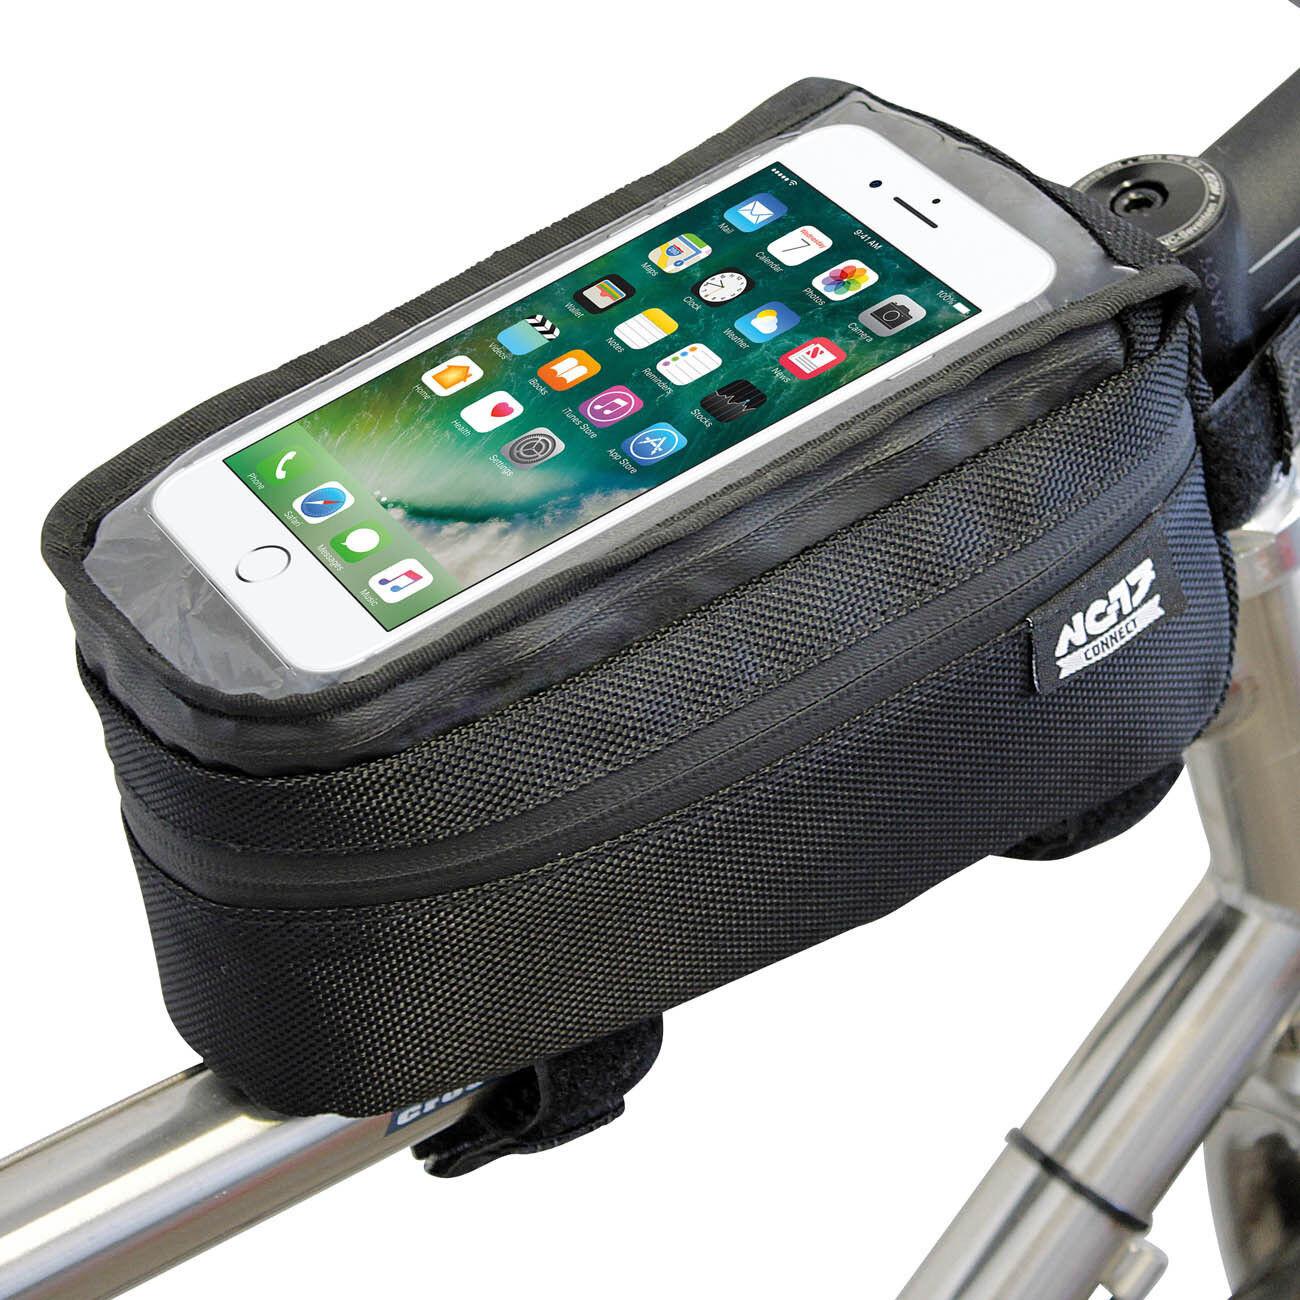 NC-17 Connect Smartphone-taske Appcon, black (2019) | Frame bags